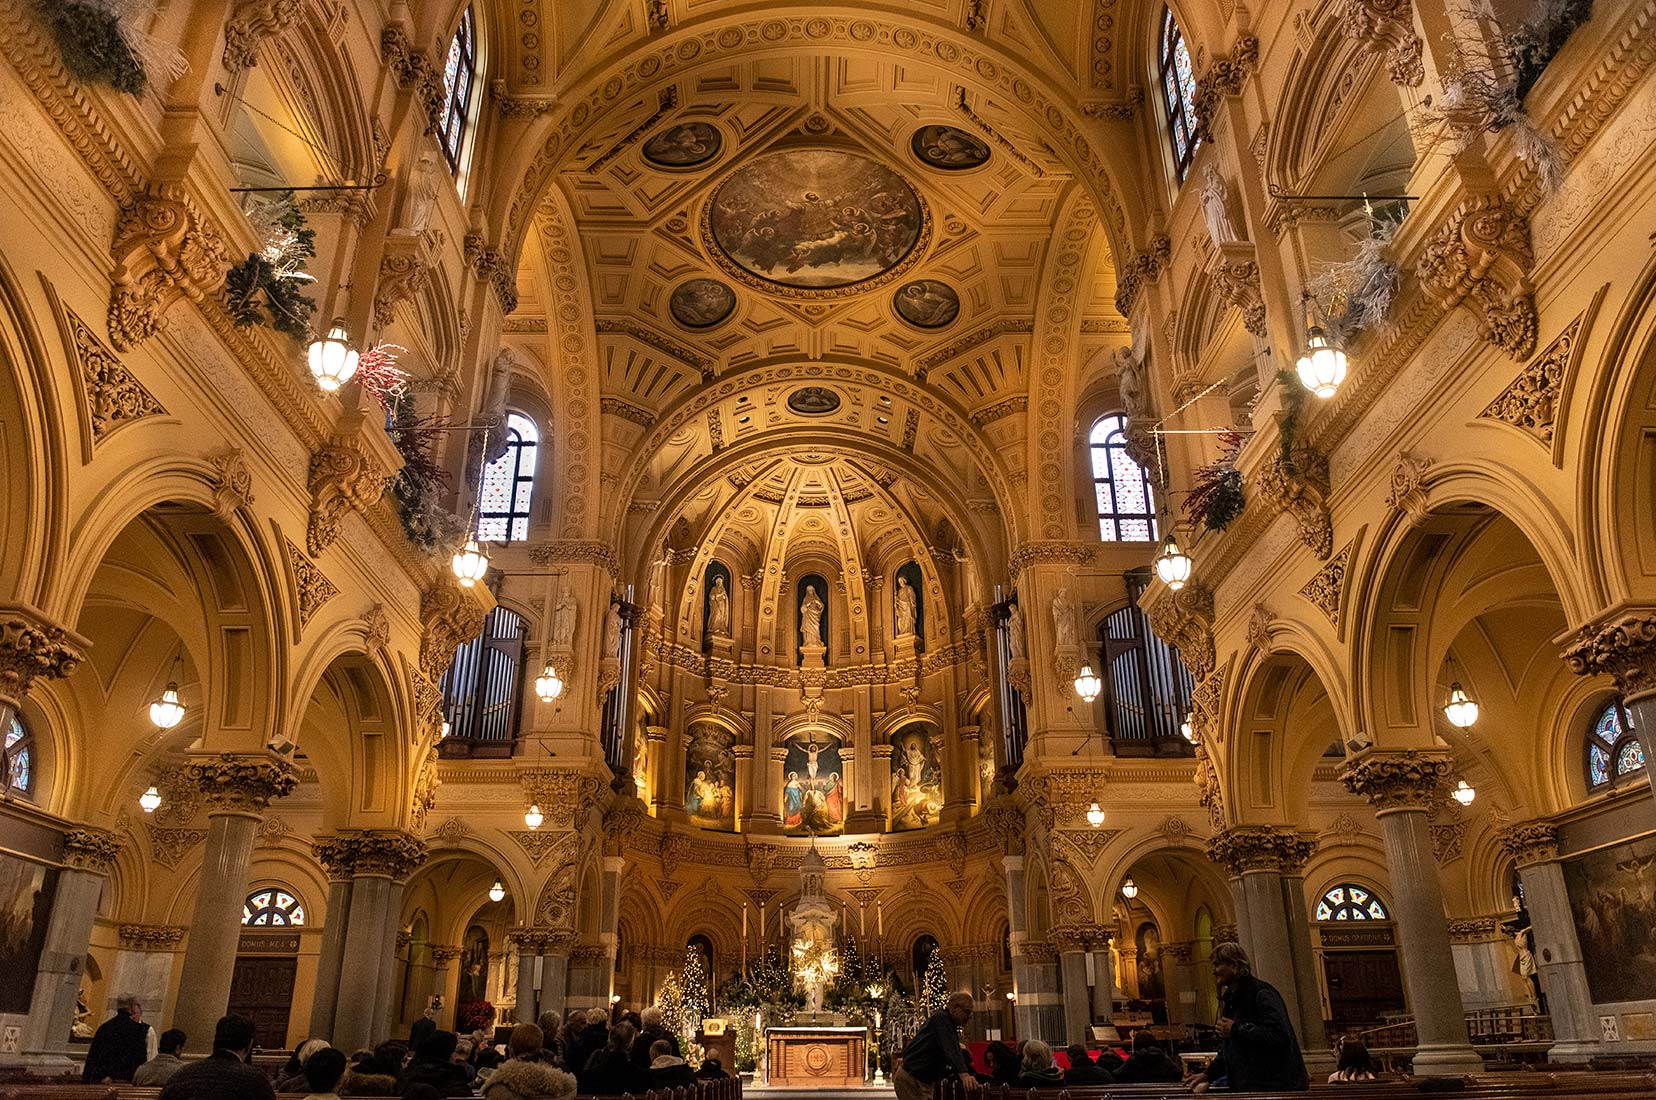 ST FRANCIS XAVIER CHURCH,NEW YORK CITY